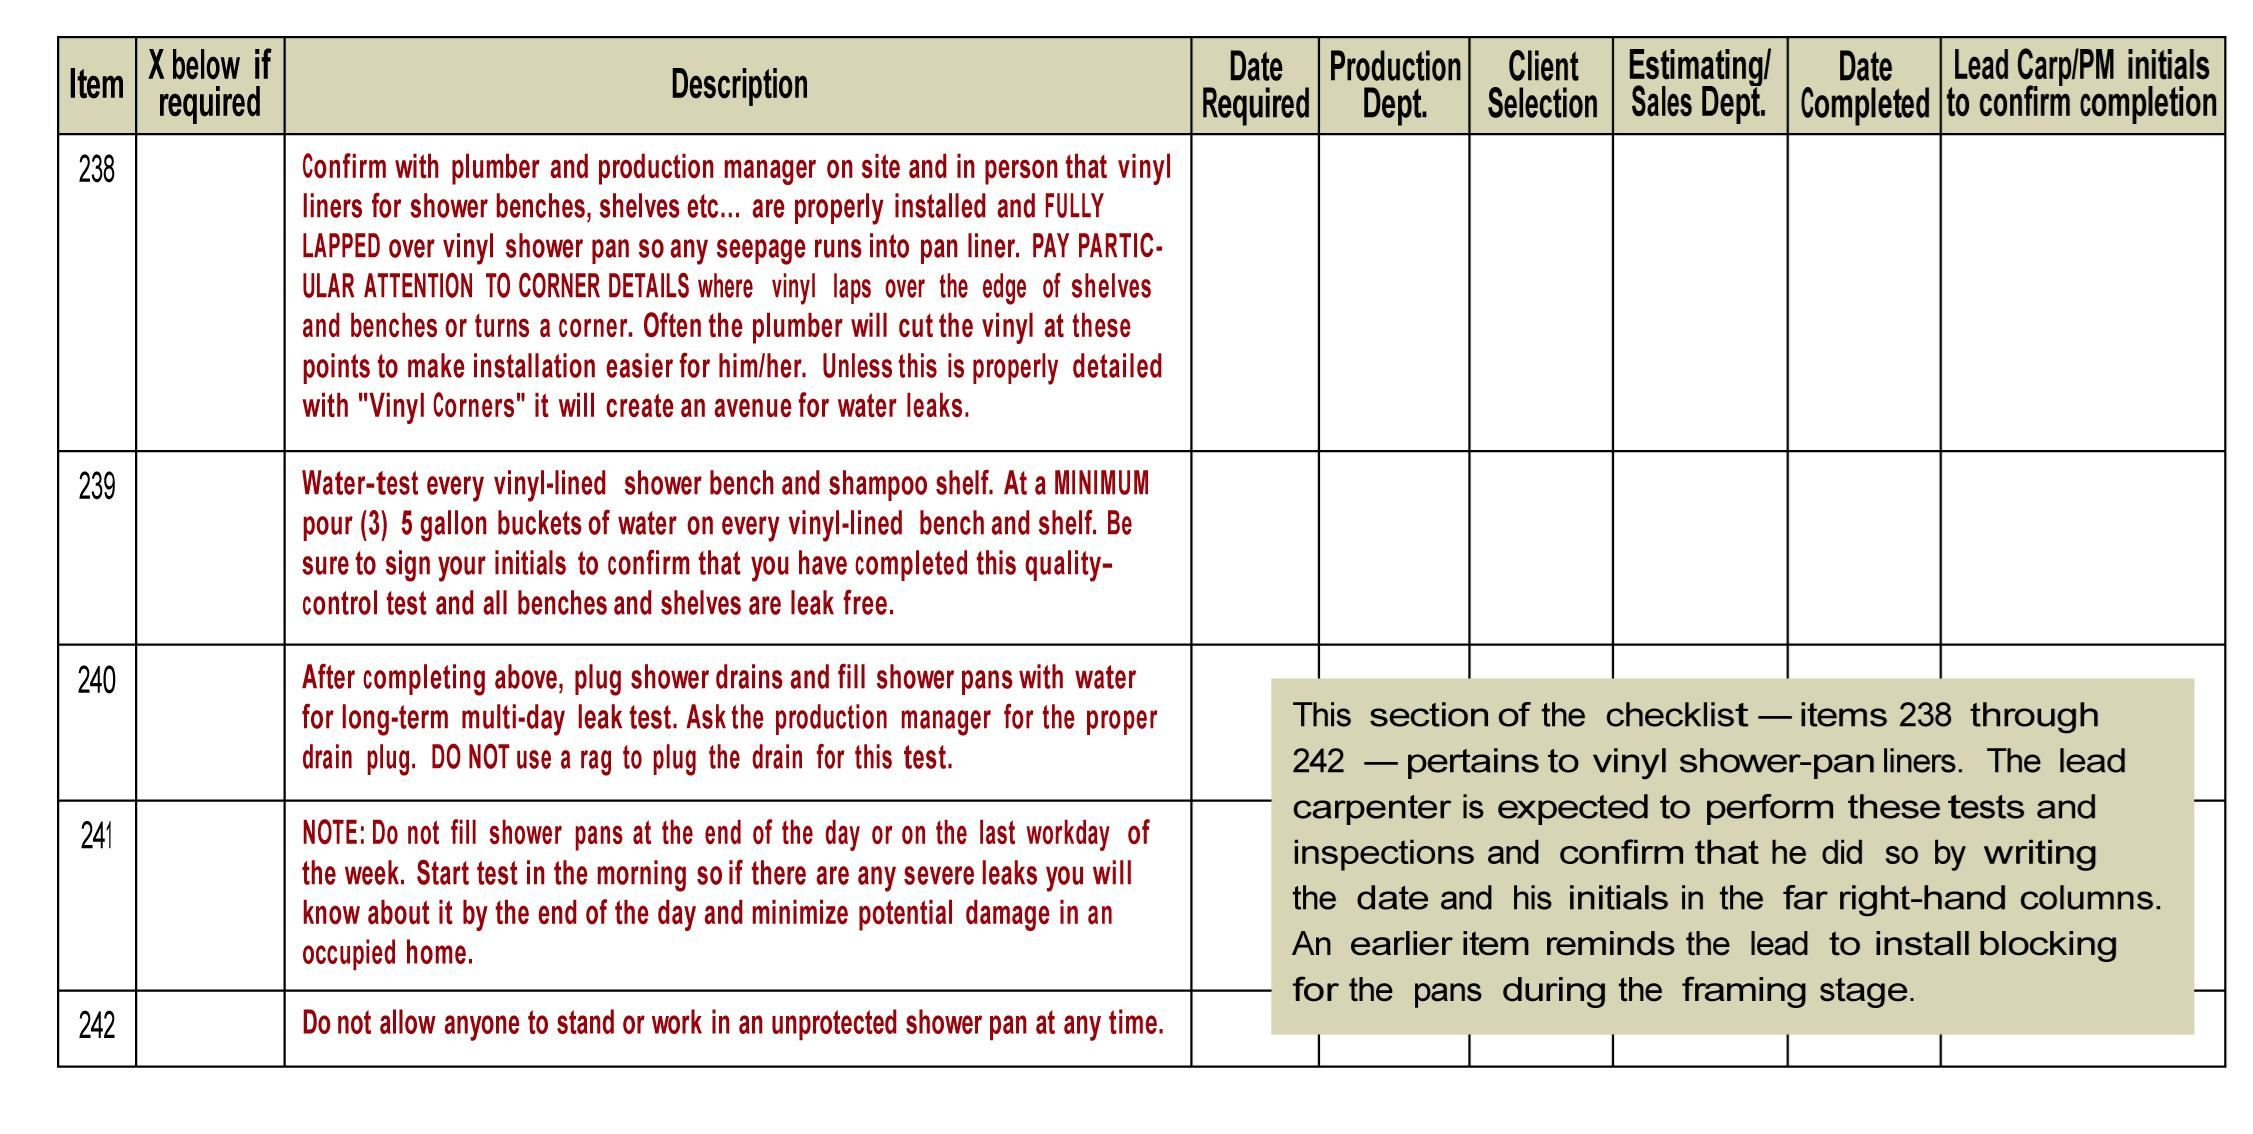 Pin by YASH UMRALIYA on Autocad Checklist, Prevention